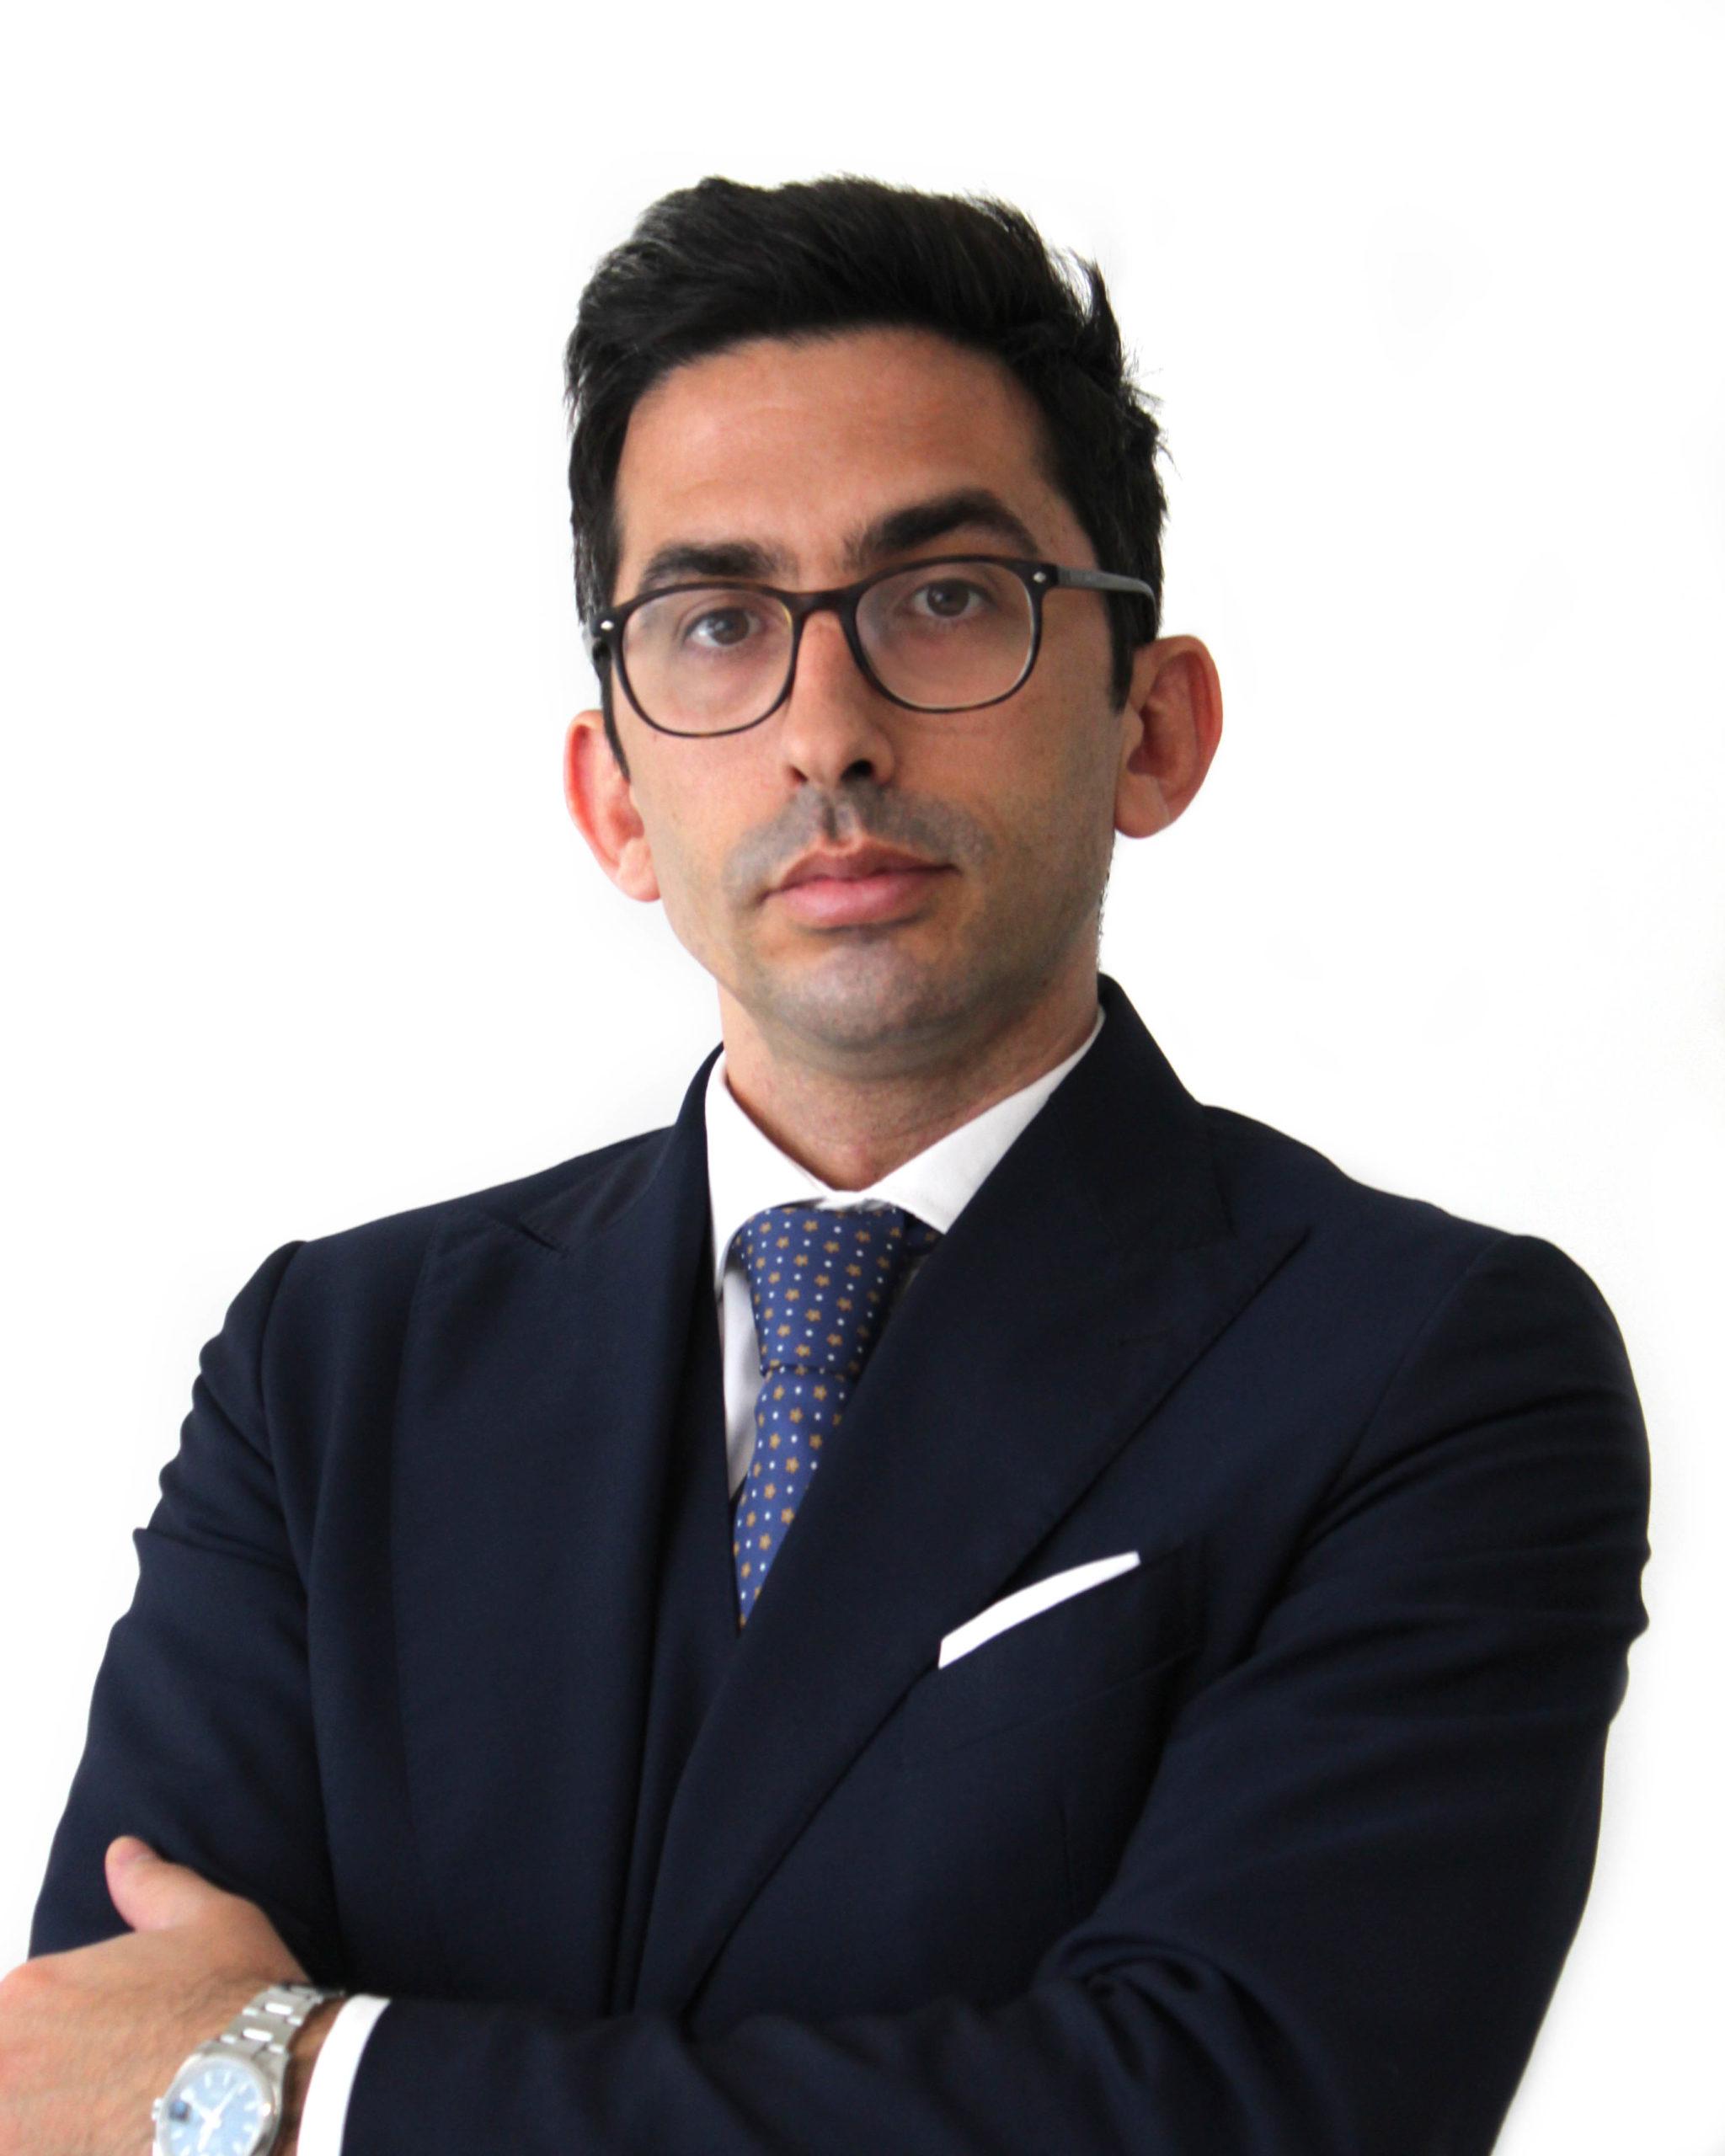 Giancarlo Marzo